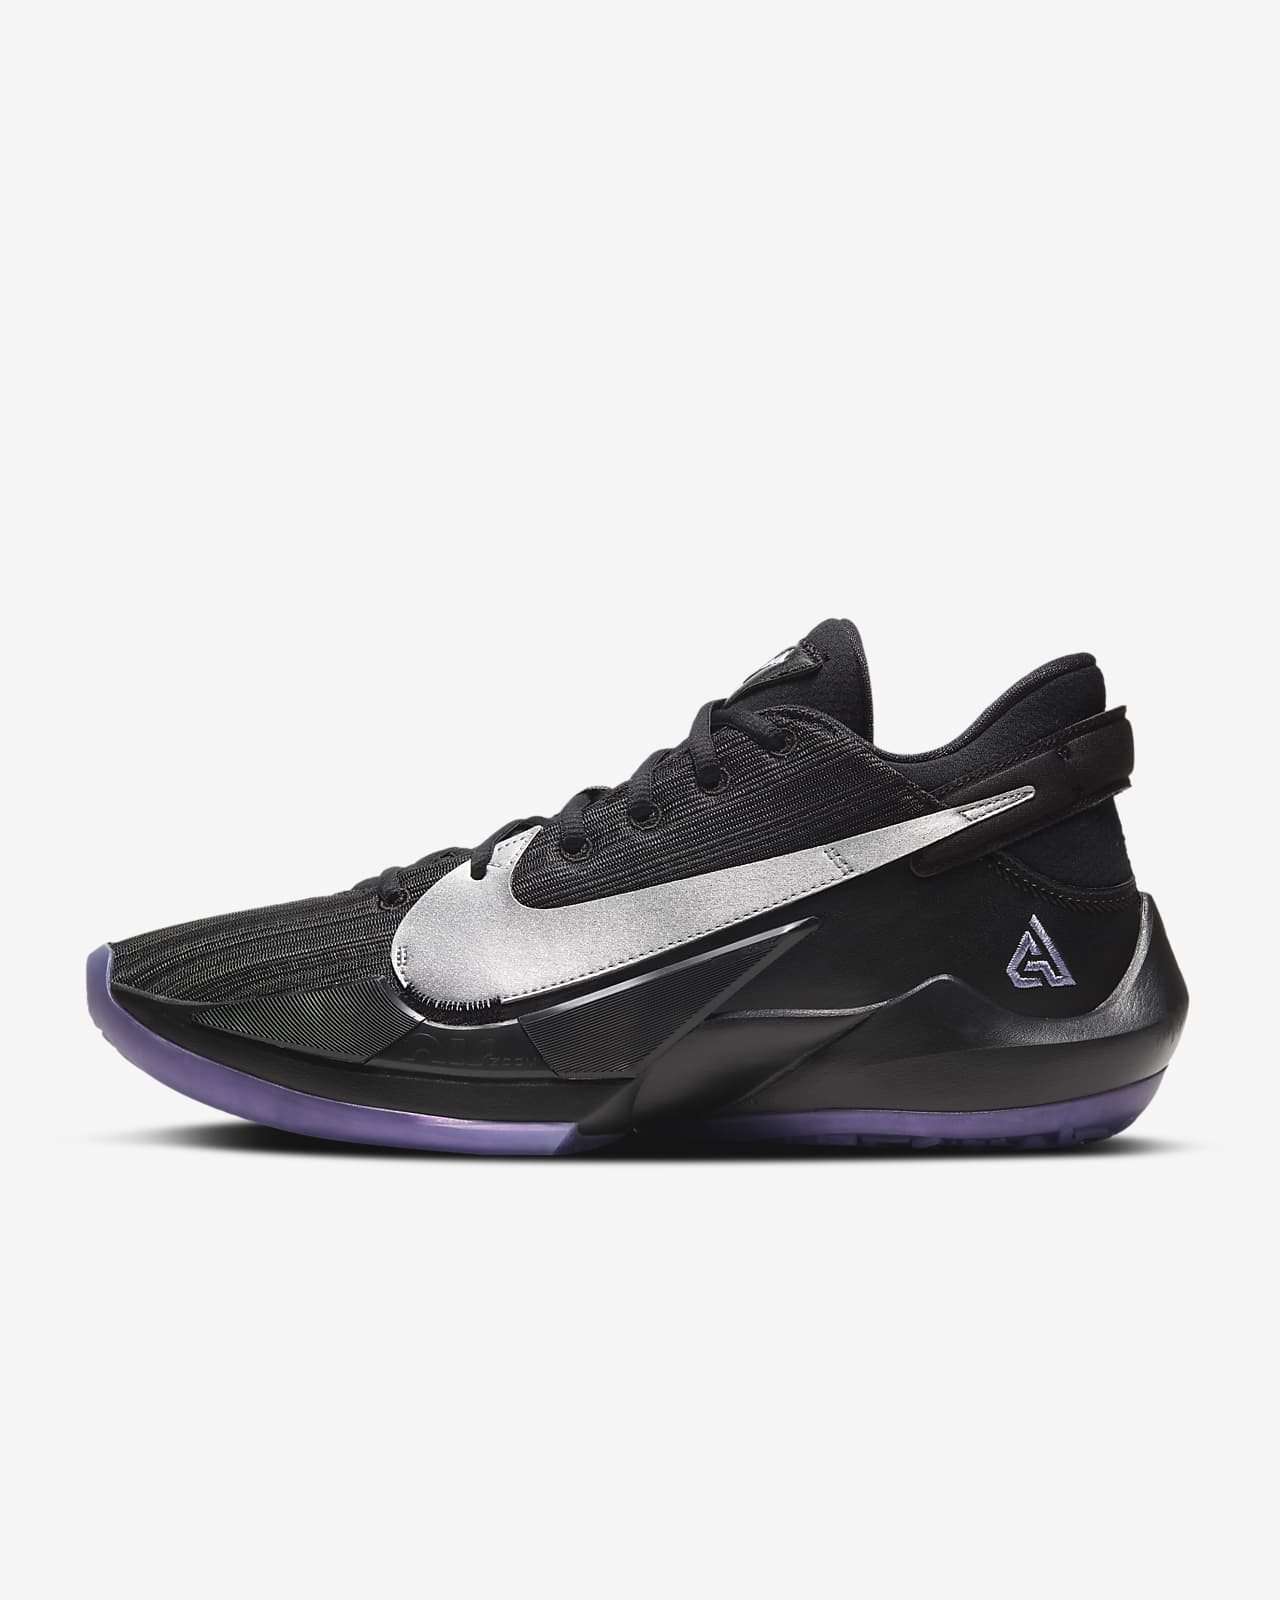 Zoom Freak 2 籃球鞋